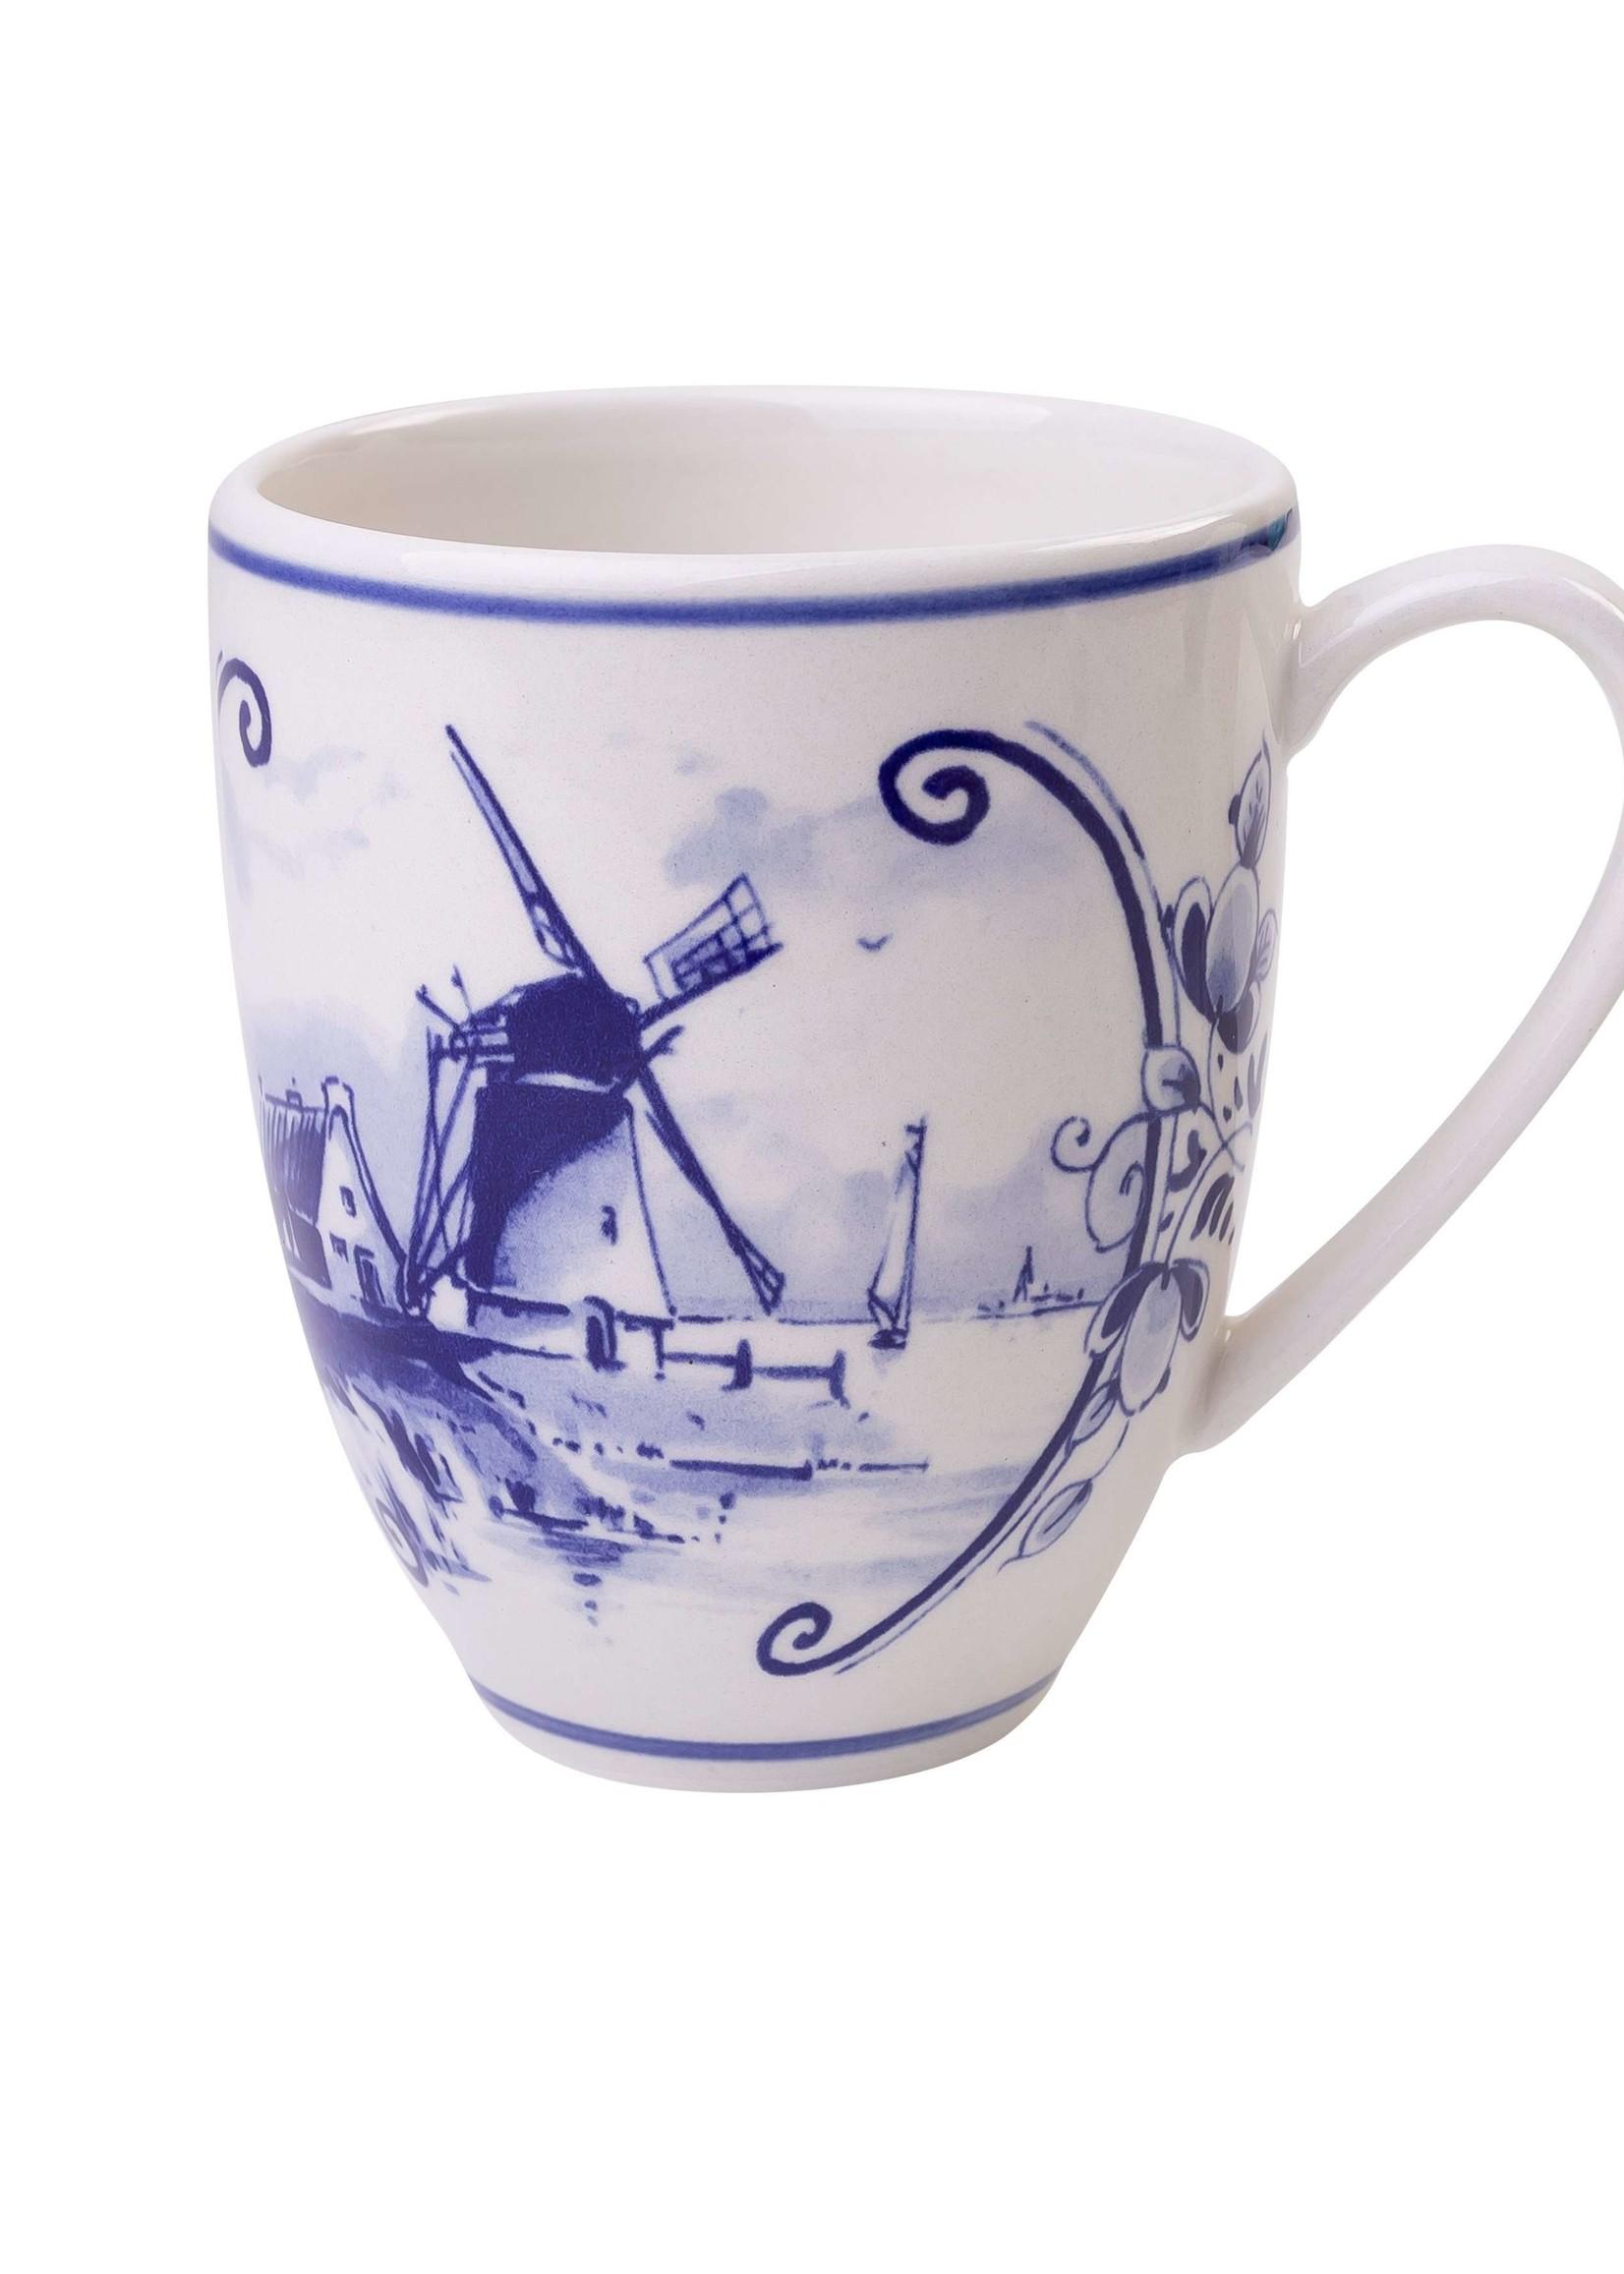 Heinen Delfts Blauw Delft Blue Coffee Mug Large, with a Dutch Landscape with a Windmill 2, 400 ml / 13,5 oz